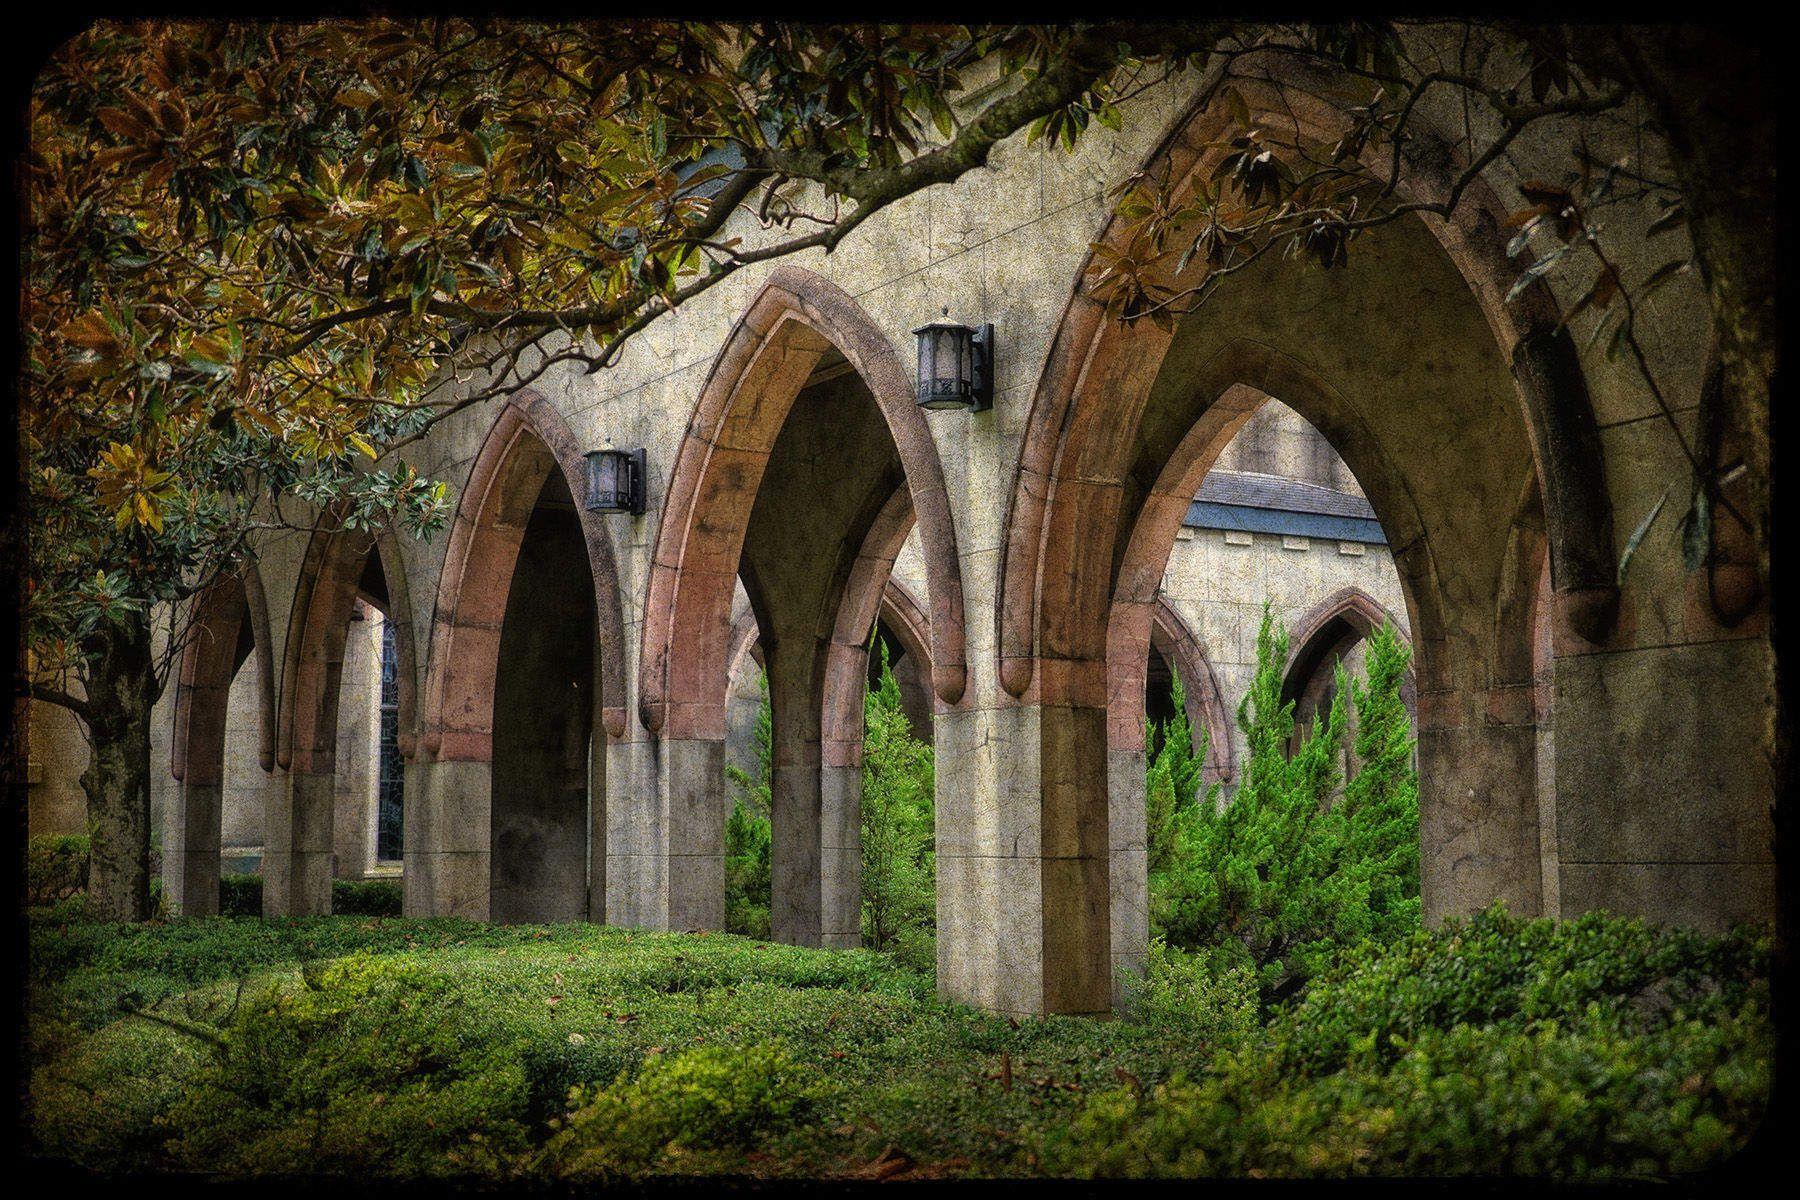 Savannah's Archway